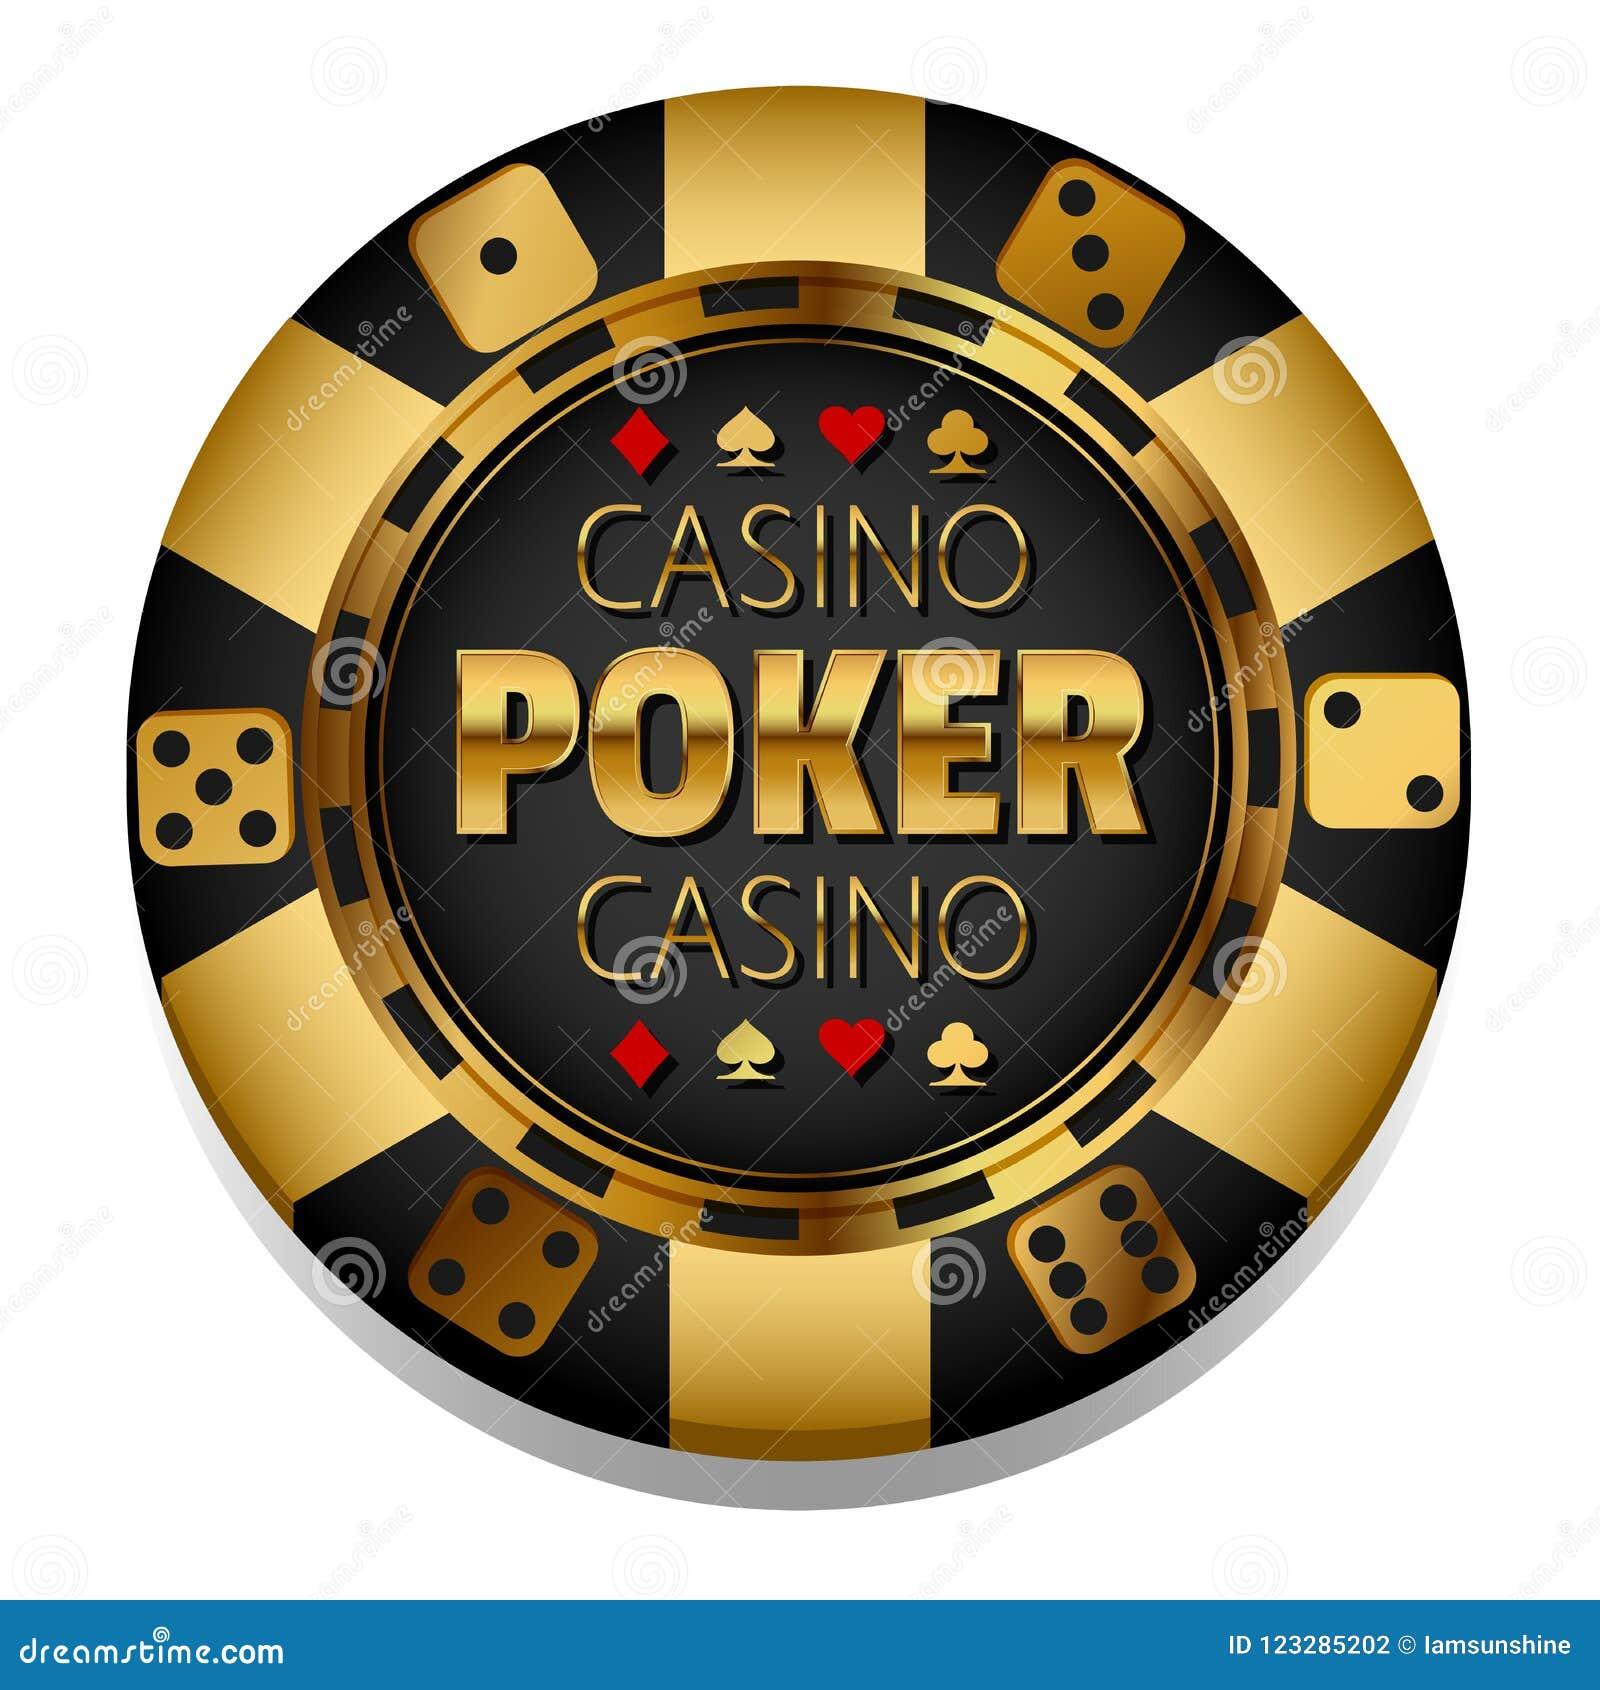 Golden casino club evan gamble